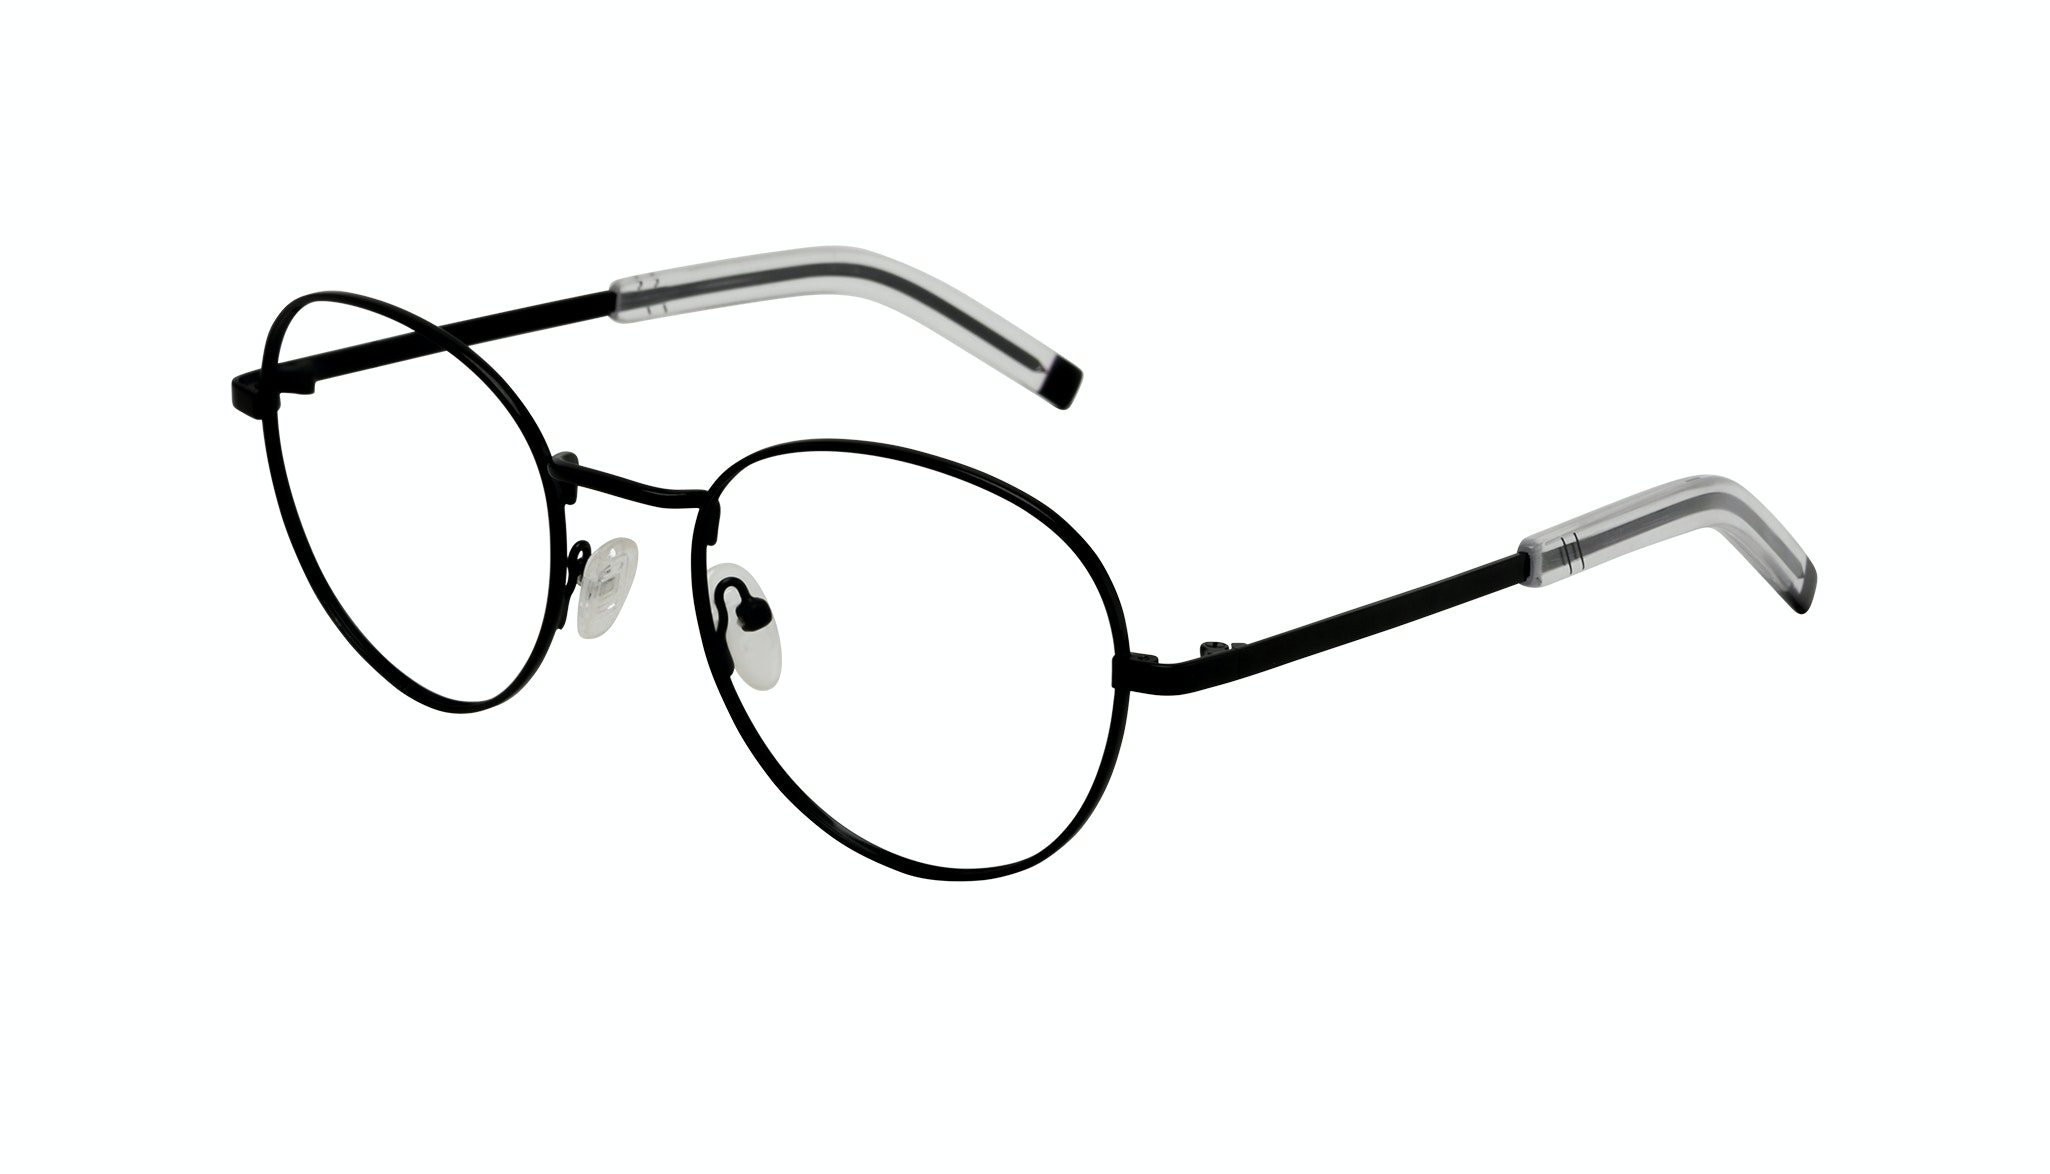 Affordable Fashion Glasses Round Eyeglasses Men Lean XL Black Tilt